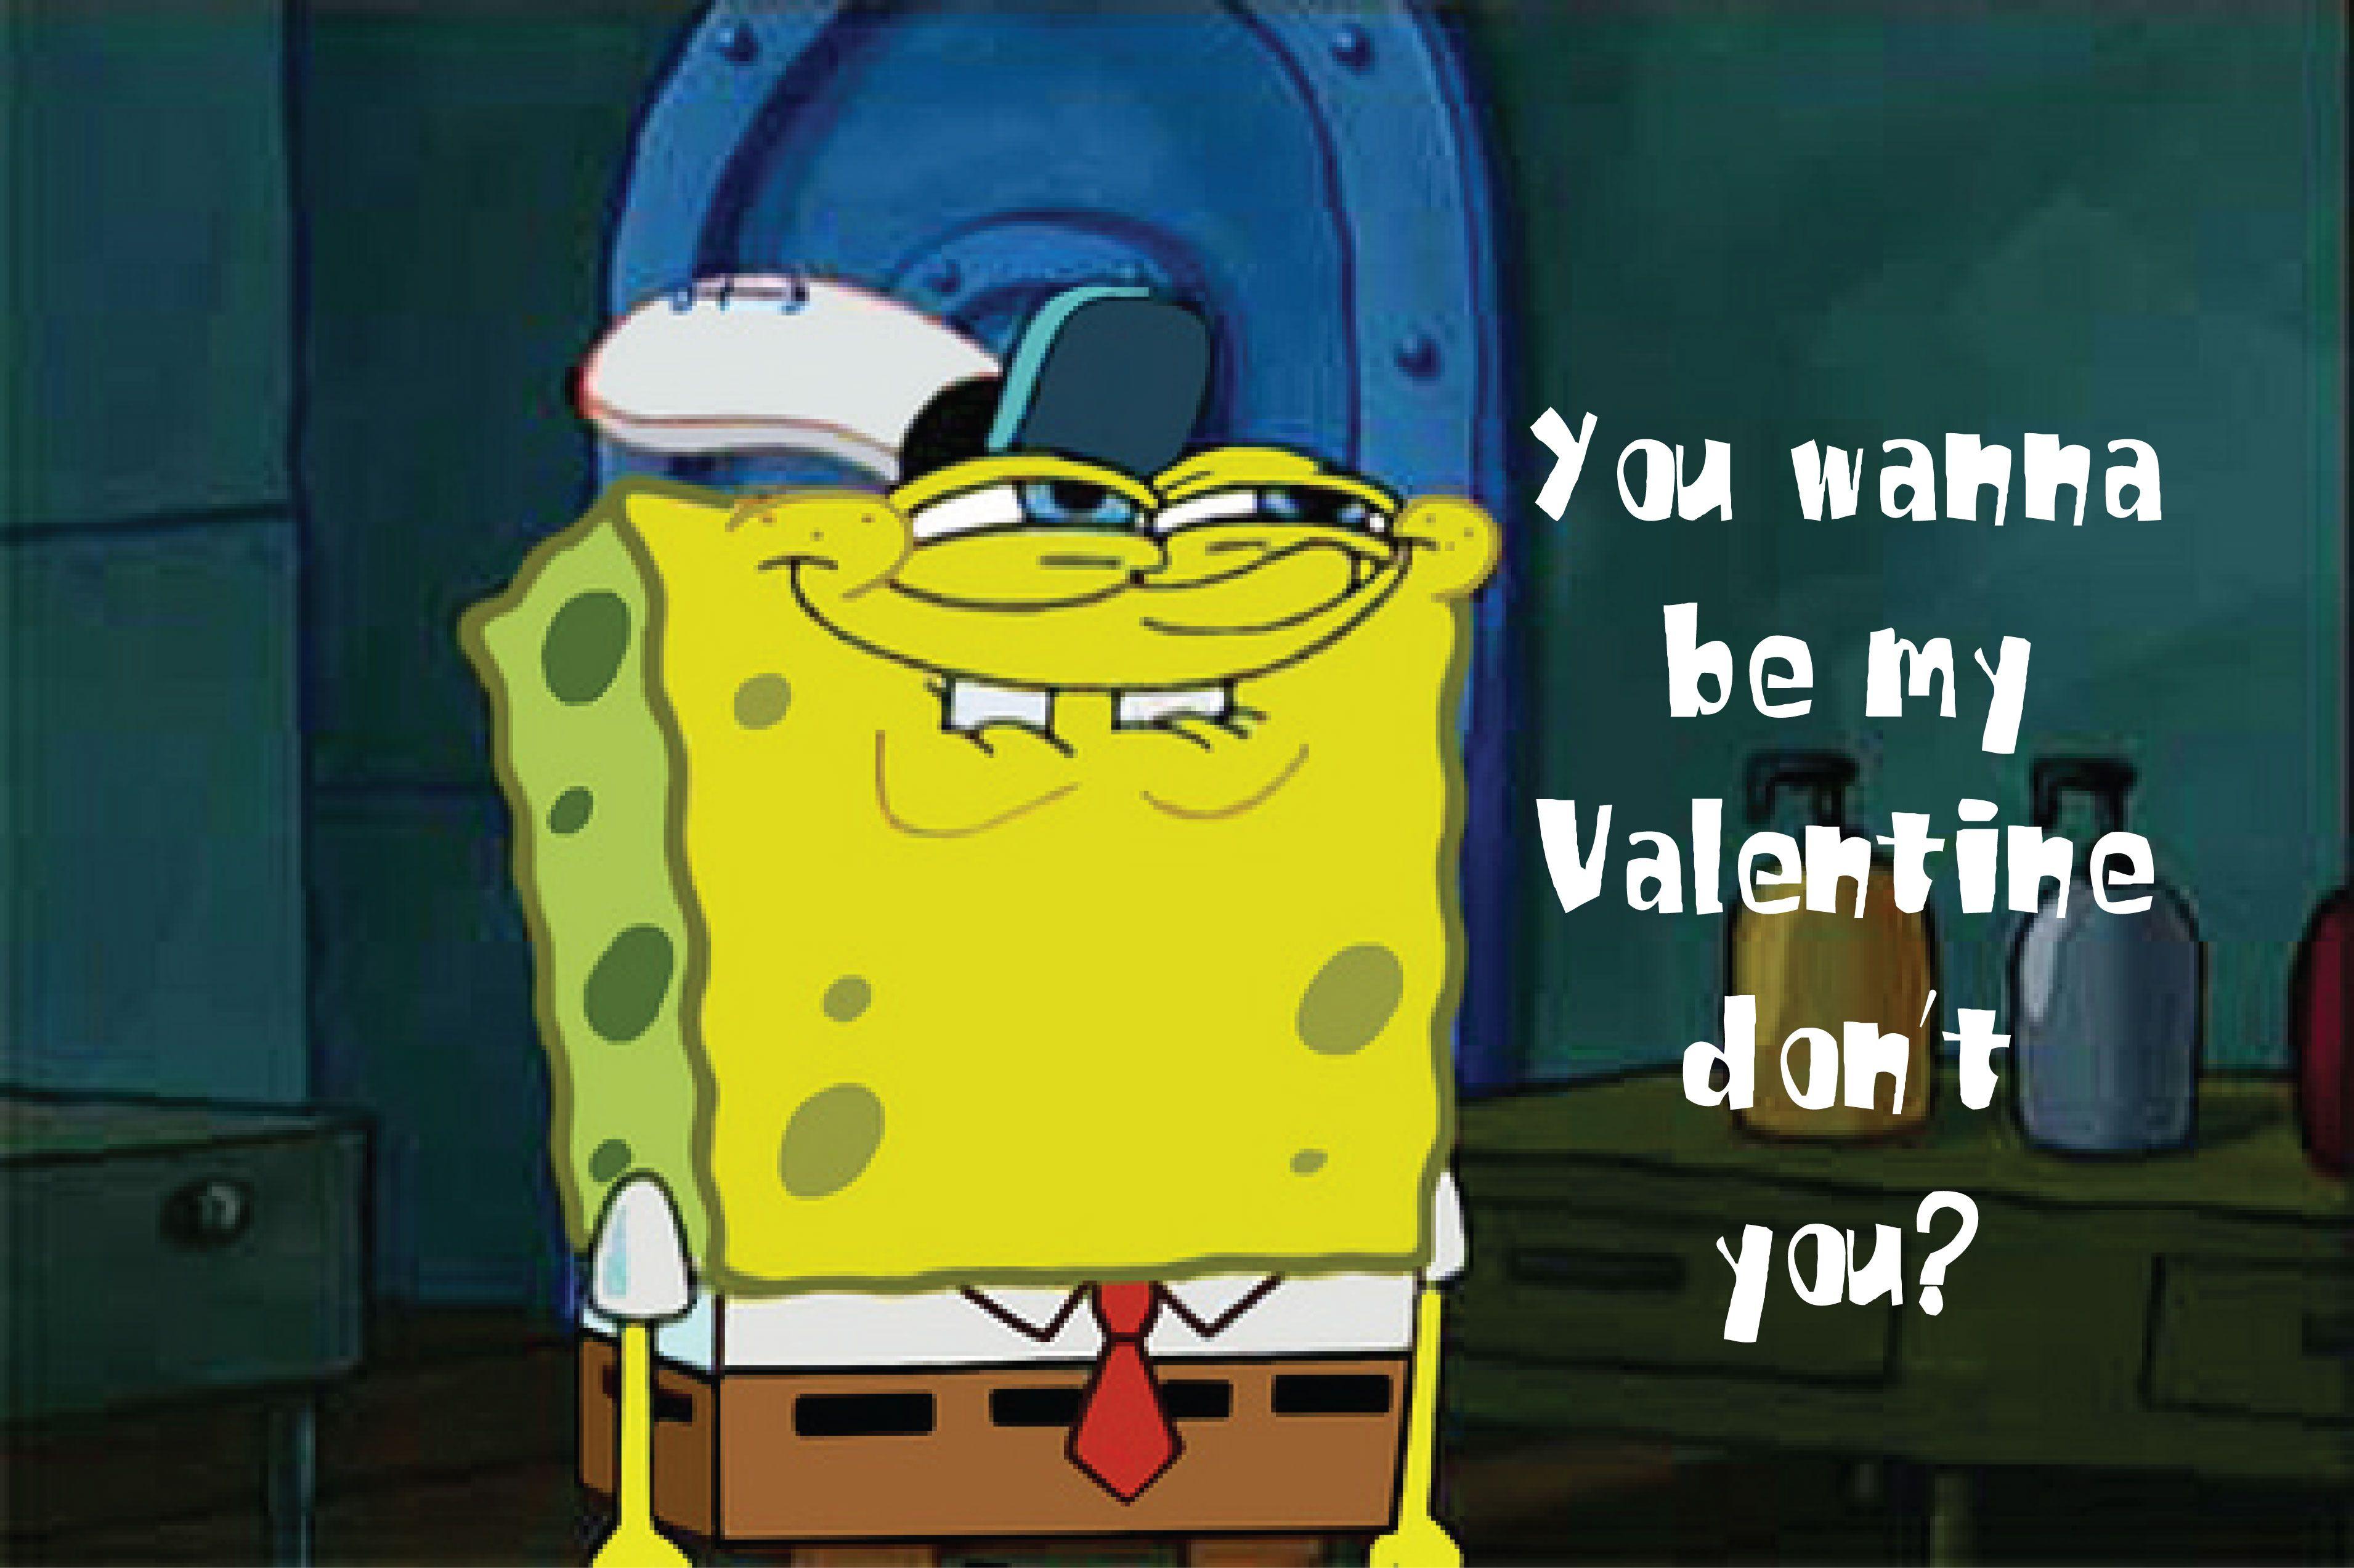 Happy valentines day from spongebob har har har funny valentines cards cheesy valentine cards funny valentine